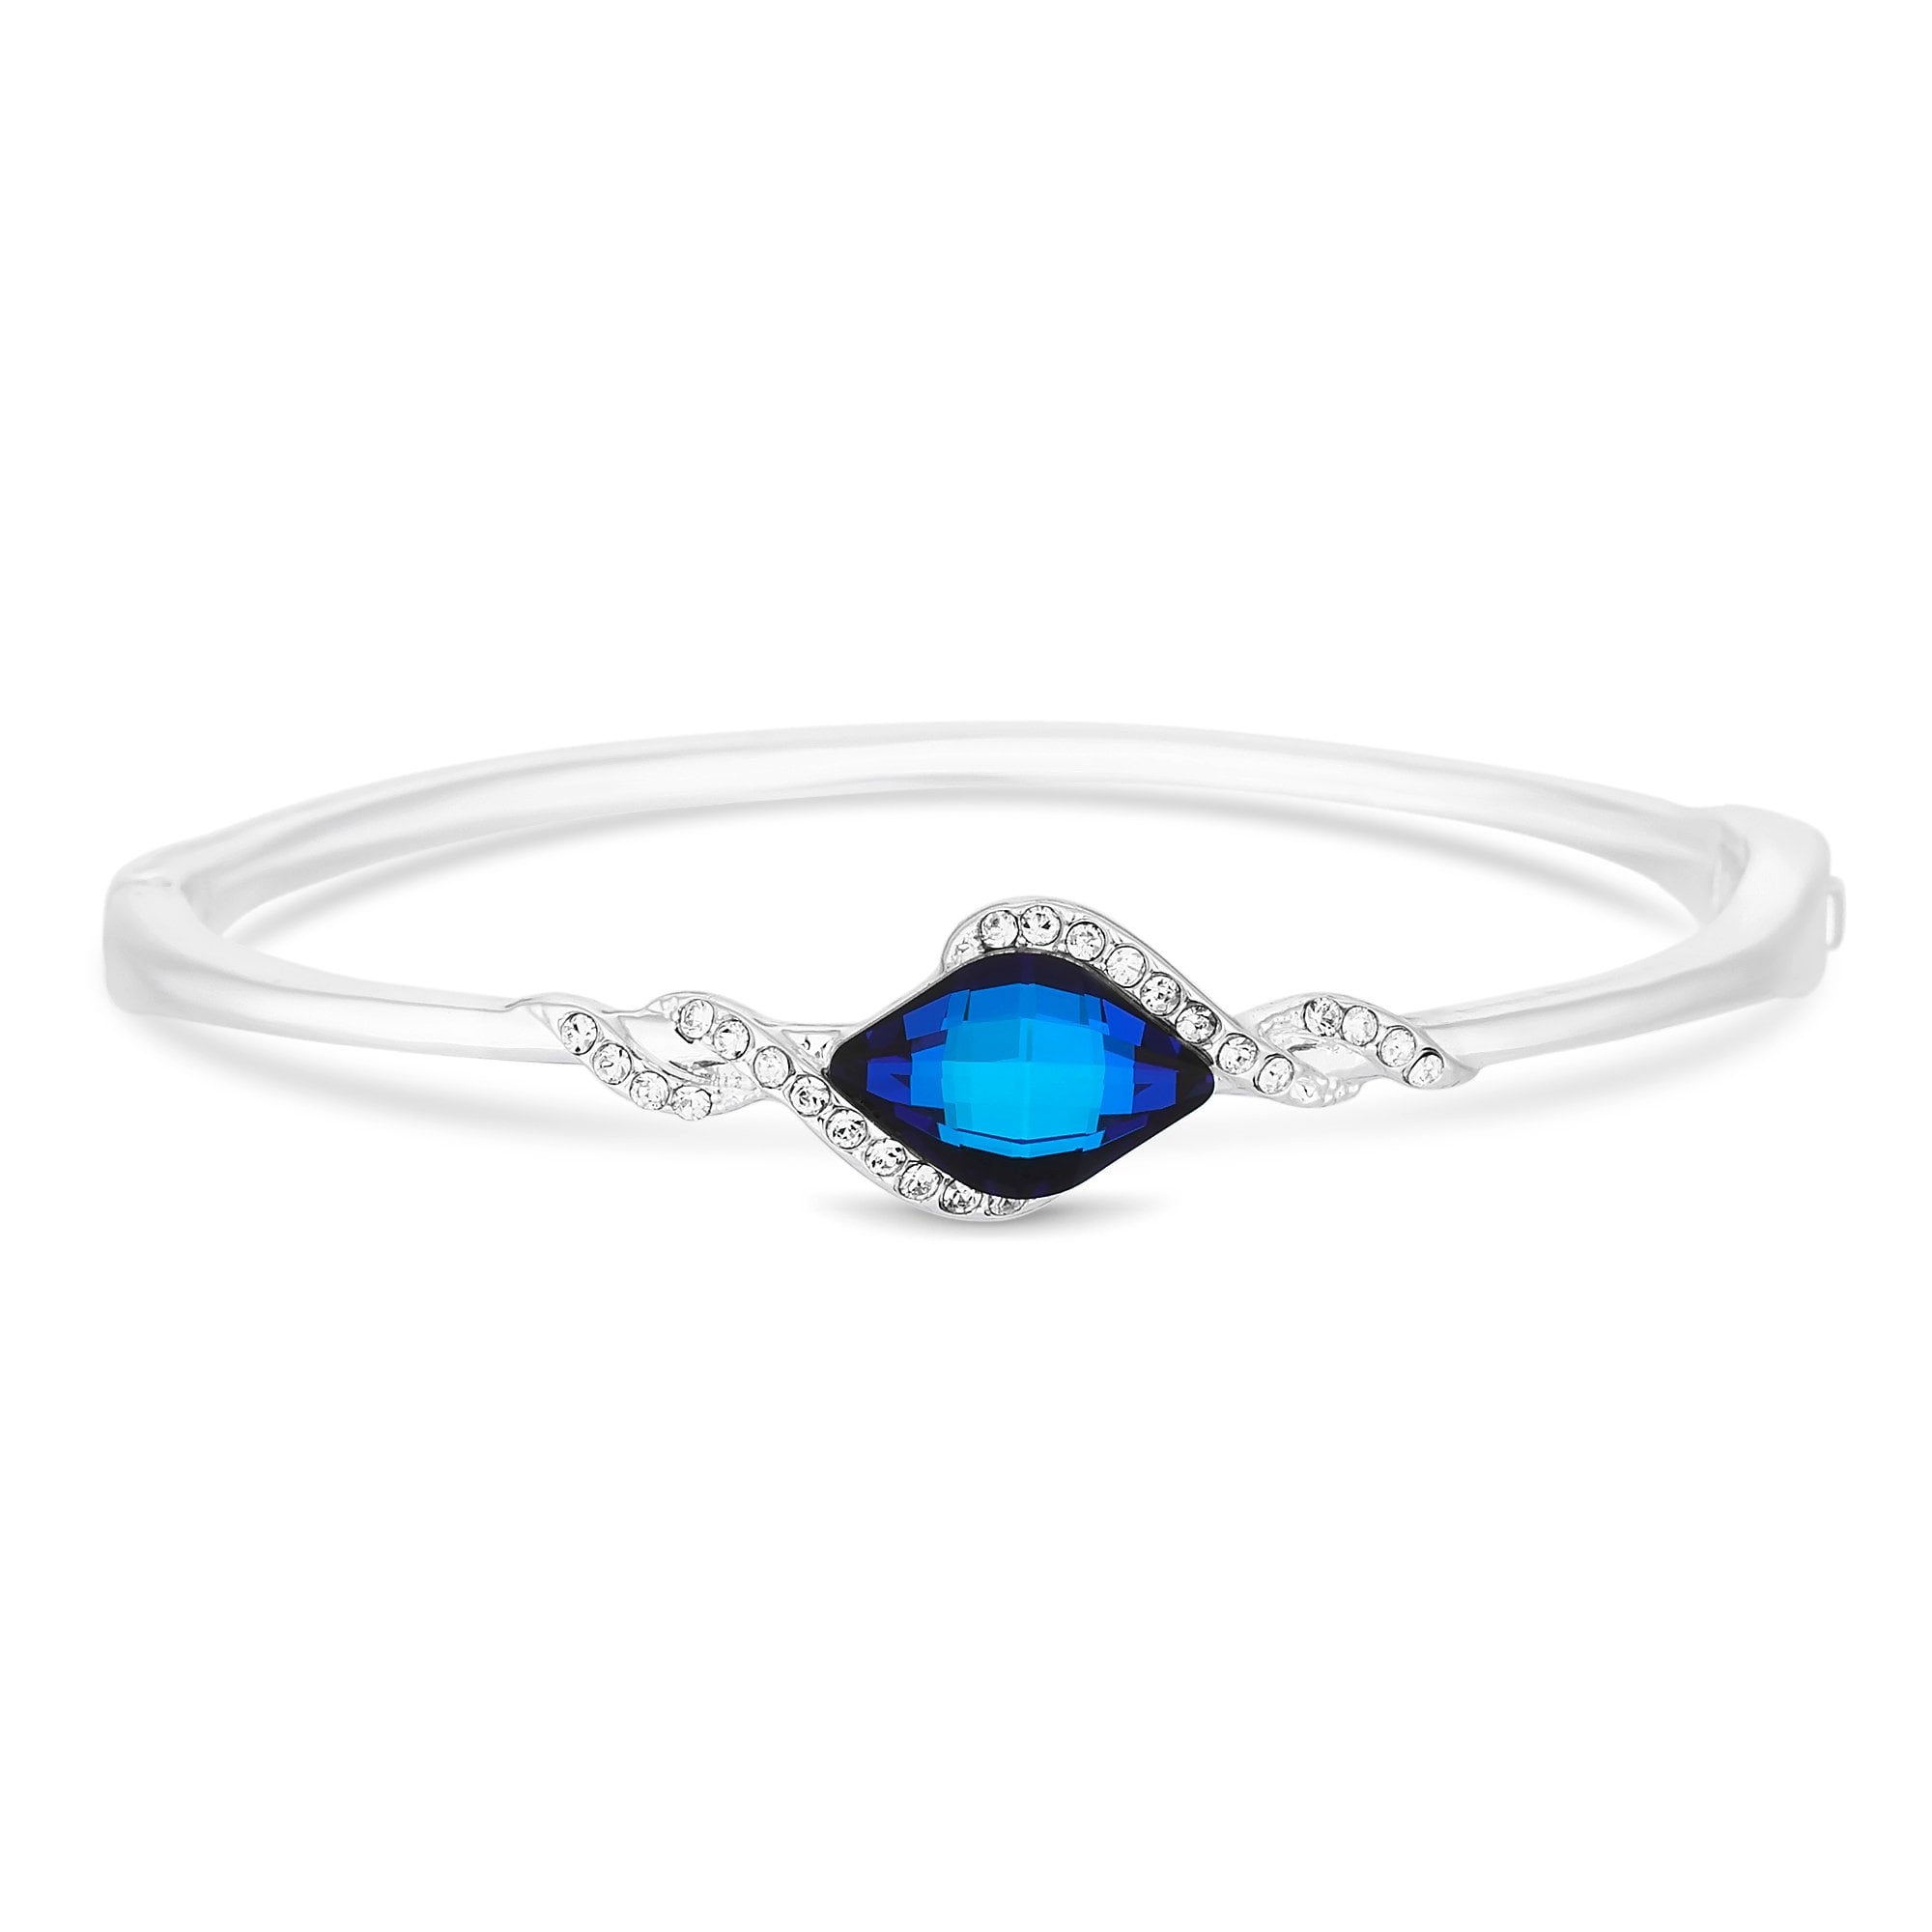 36b78a1f2f5f Jon Richard made with Swarovski® crystals Silver Plated Blue Lemon Fancy  Silver Bangle Bracelet Embellished